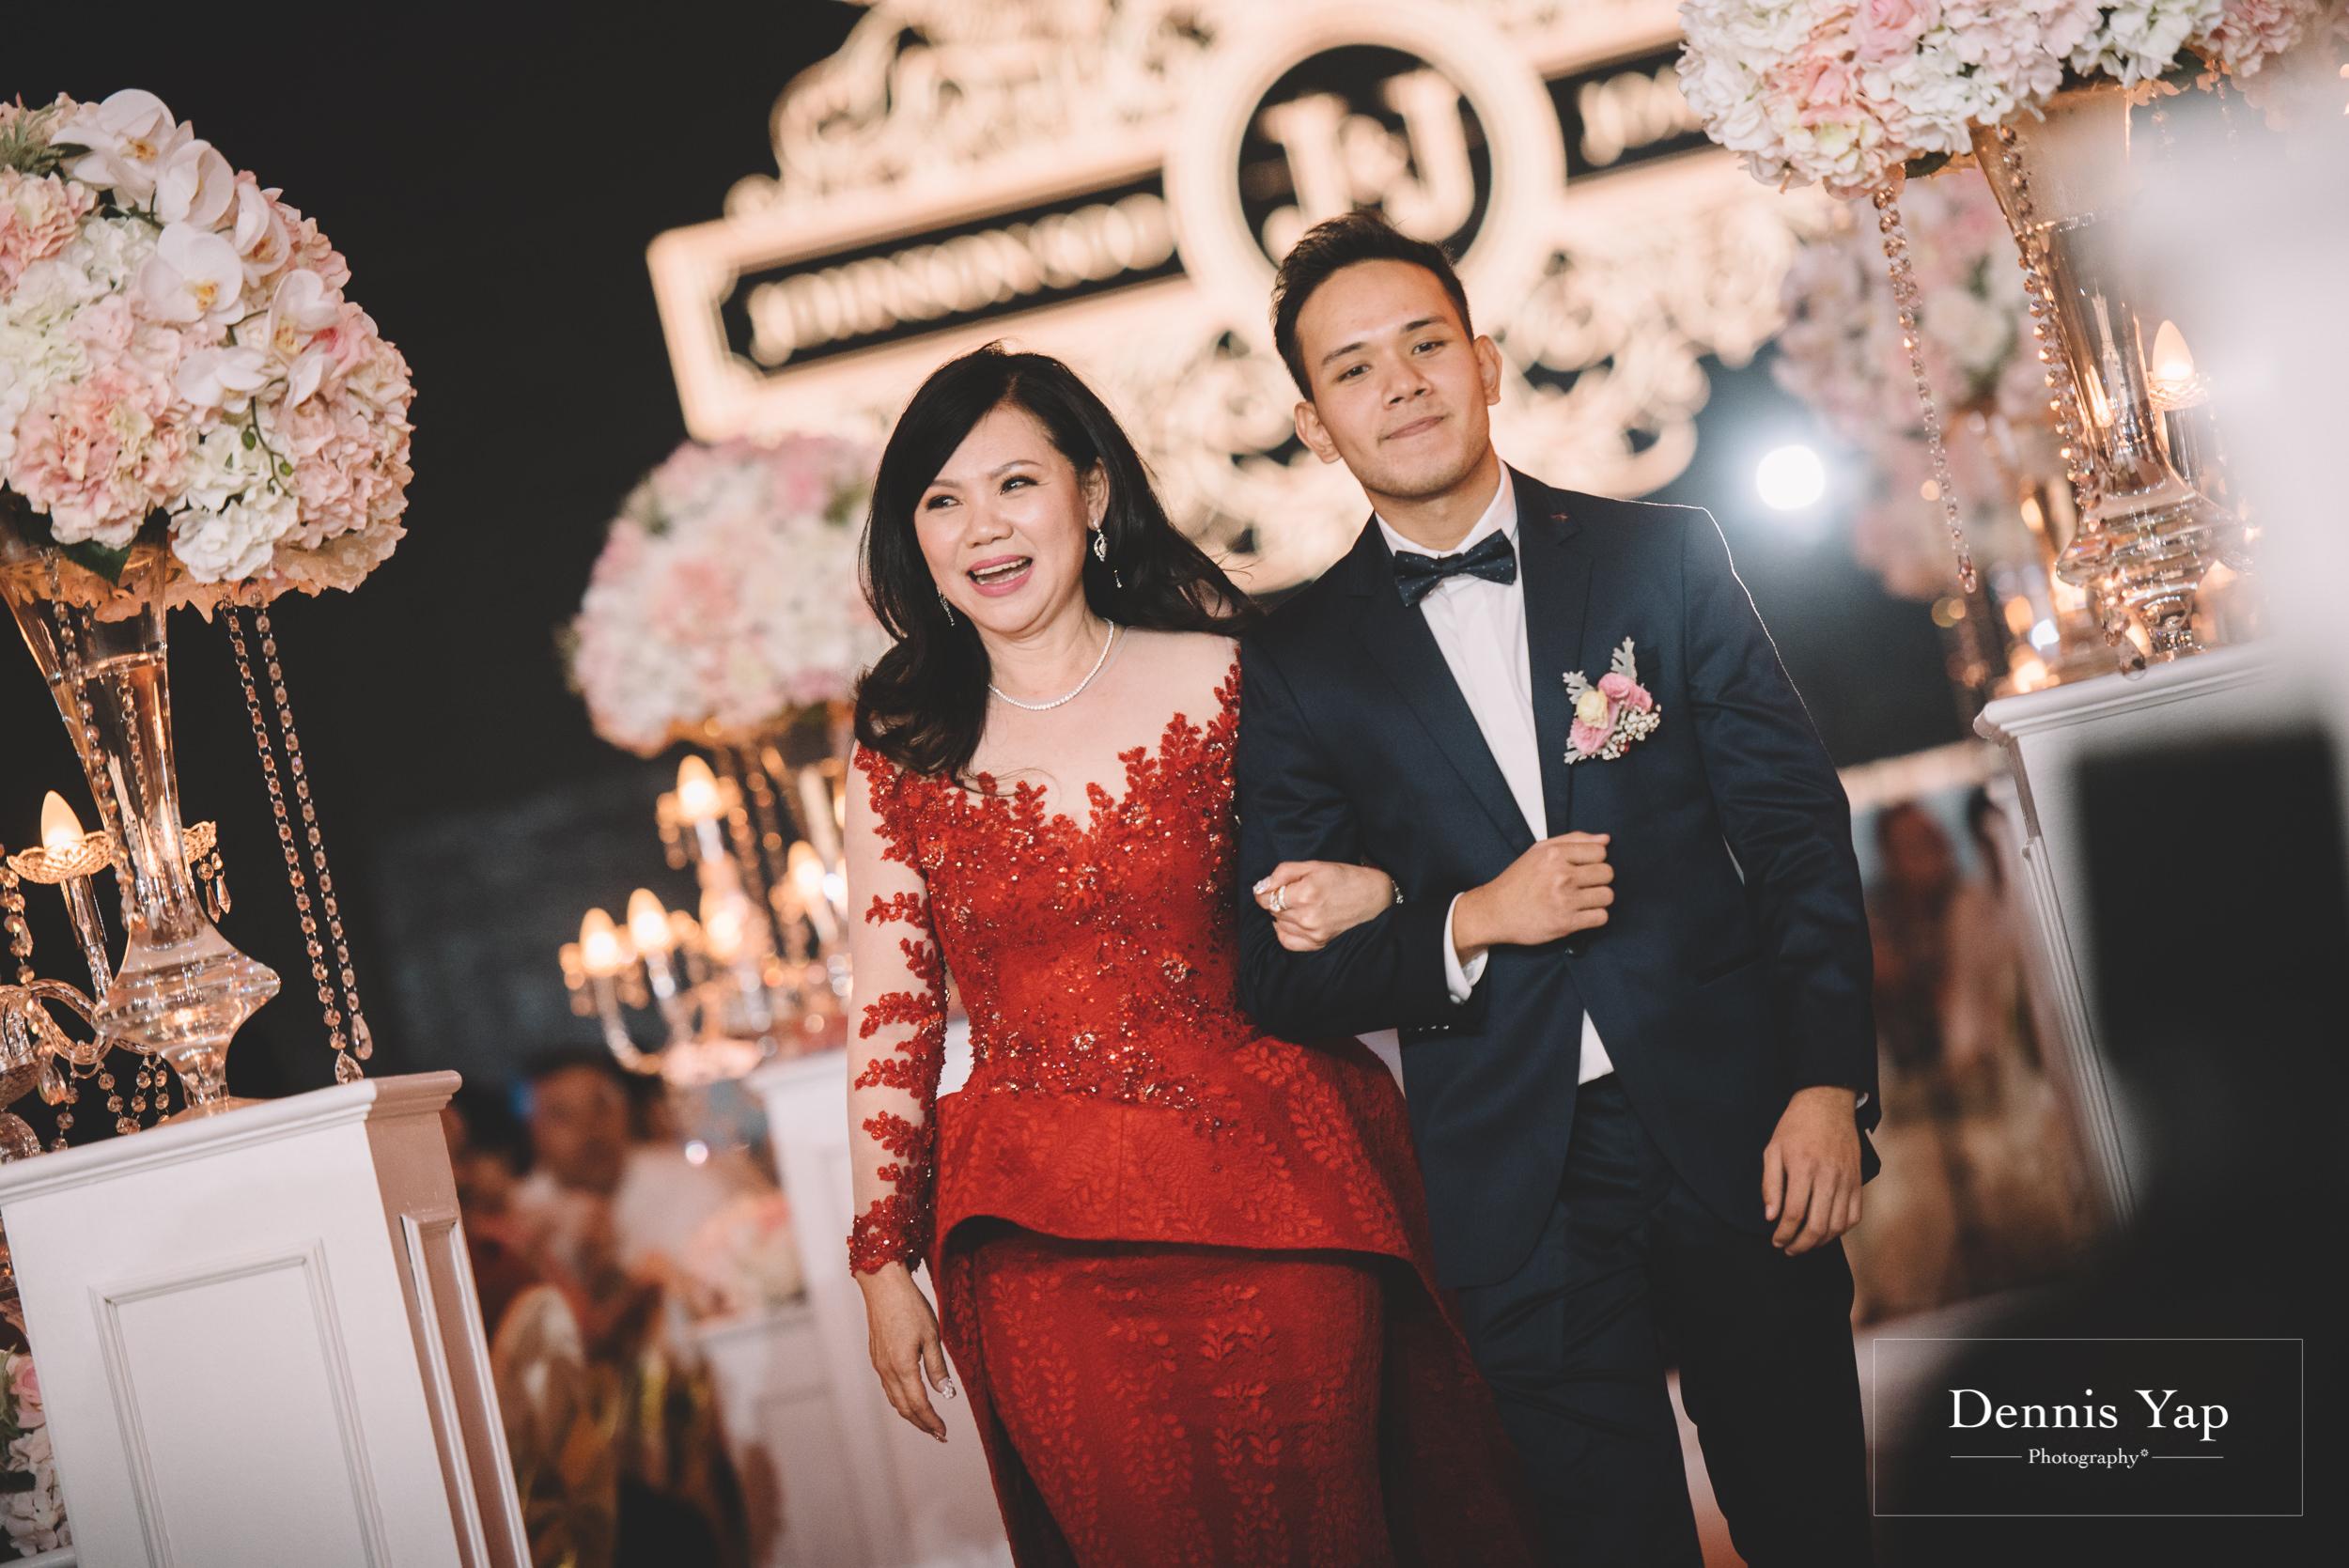 johnson joanne wedding dinner klang centro malaysia wedding photographer dennis yap-6.jpg